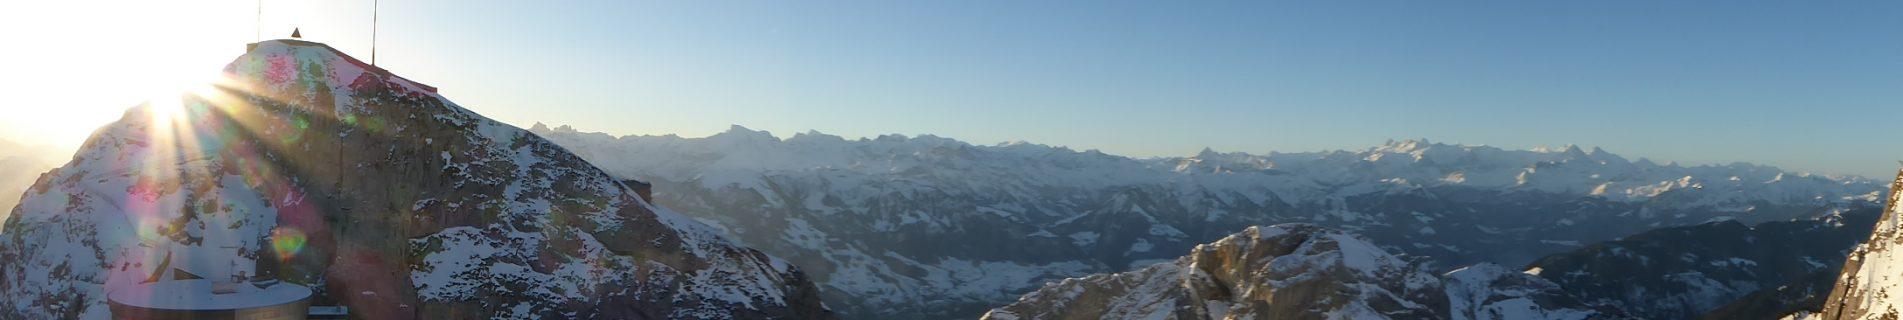 cropped-PanoramaPilatus3.jpg